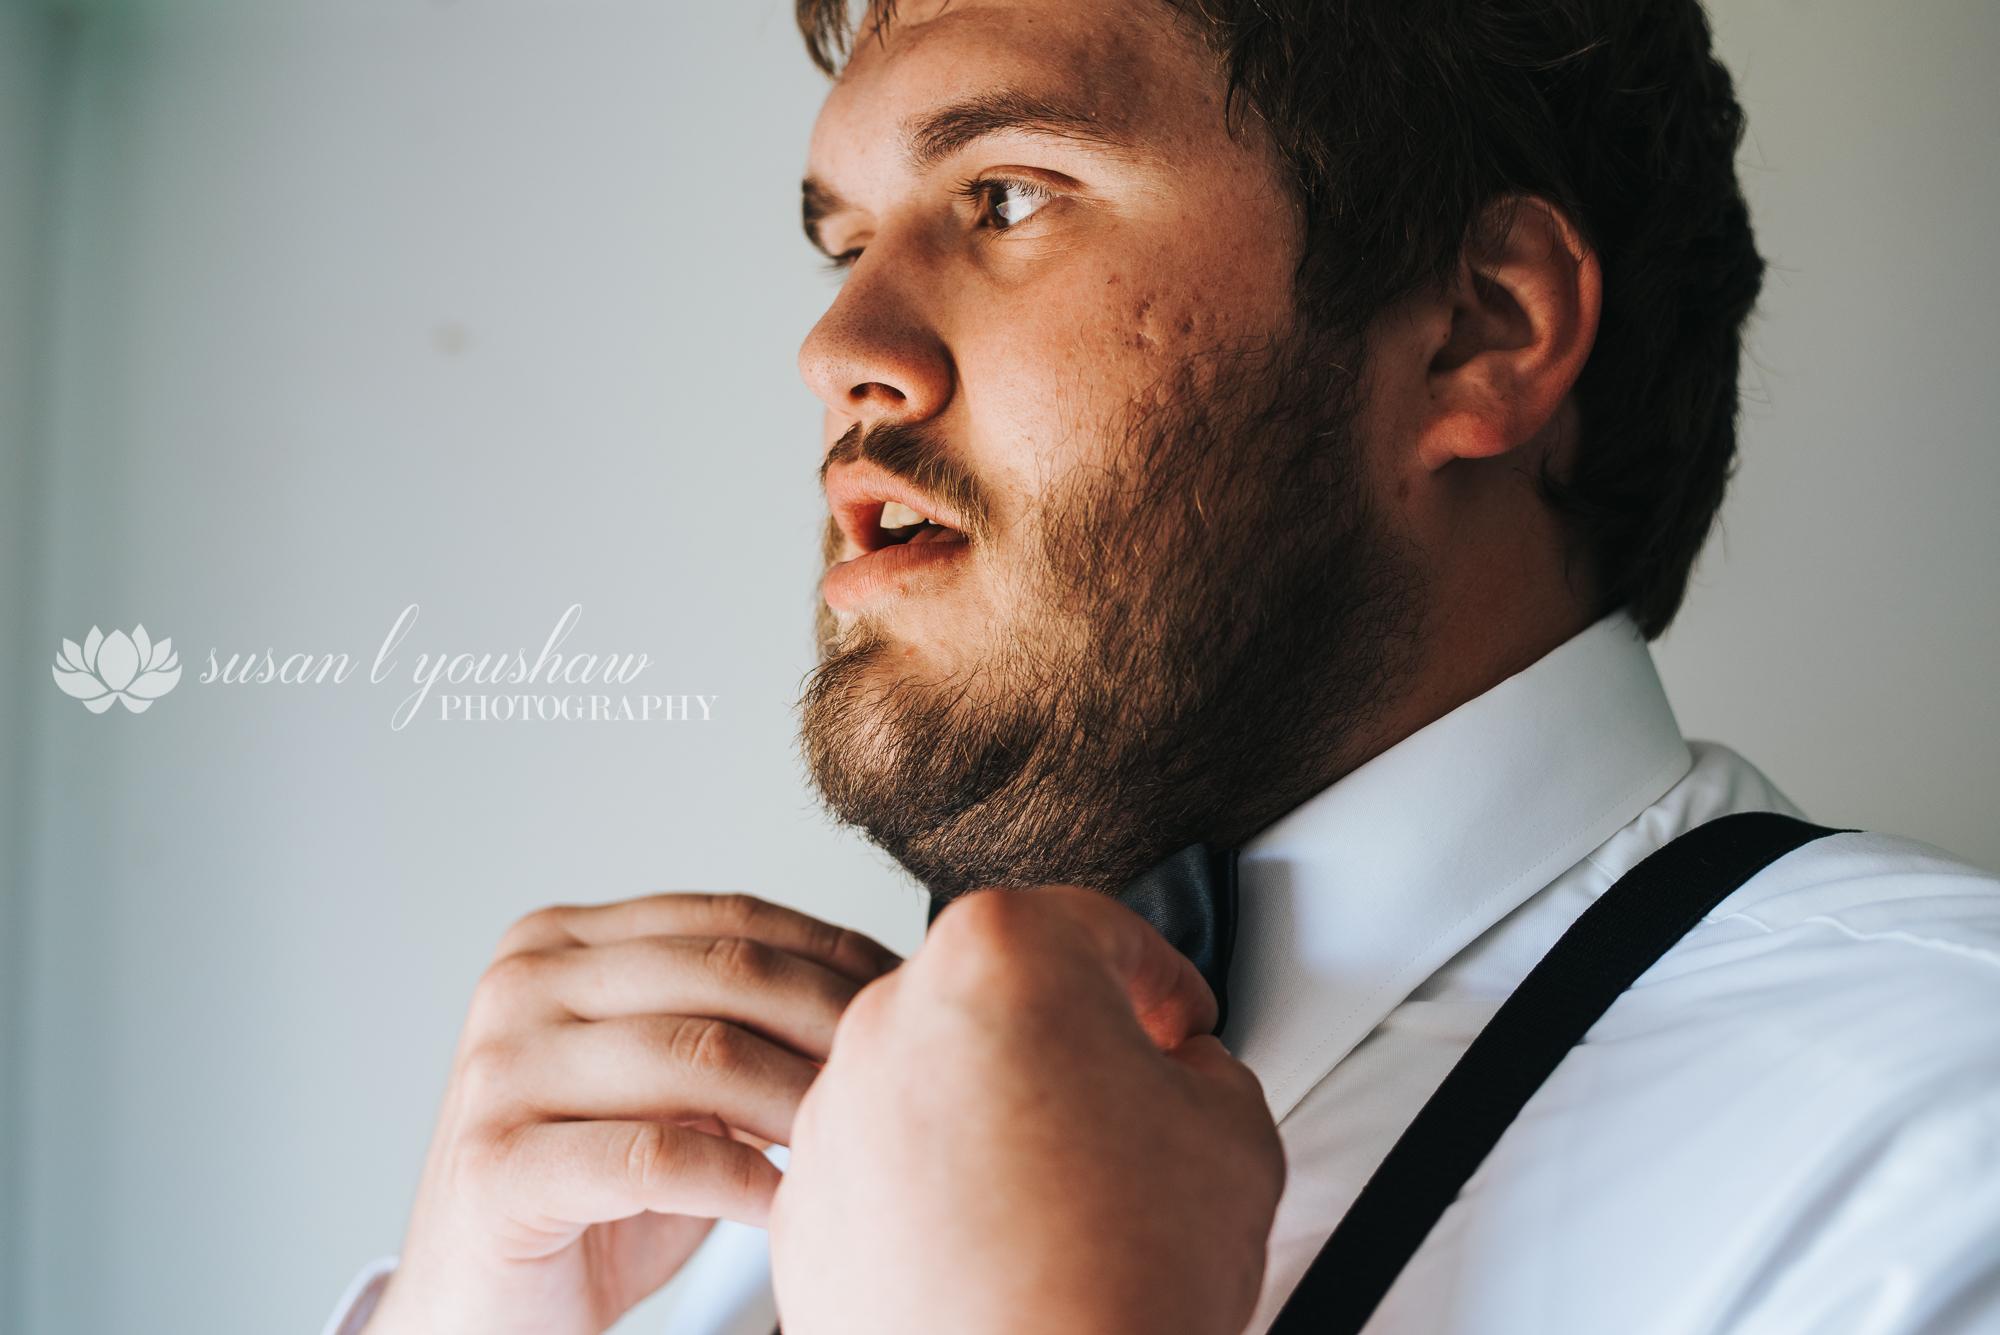 Katelyn and Wes Wedding Photos 07-13-2019 SLY Photography-16.jpg